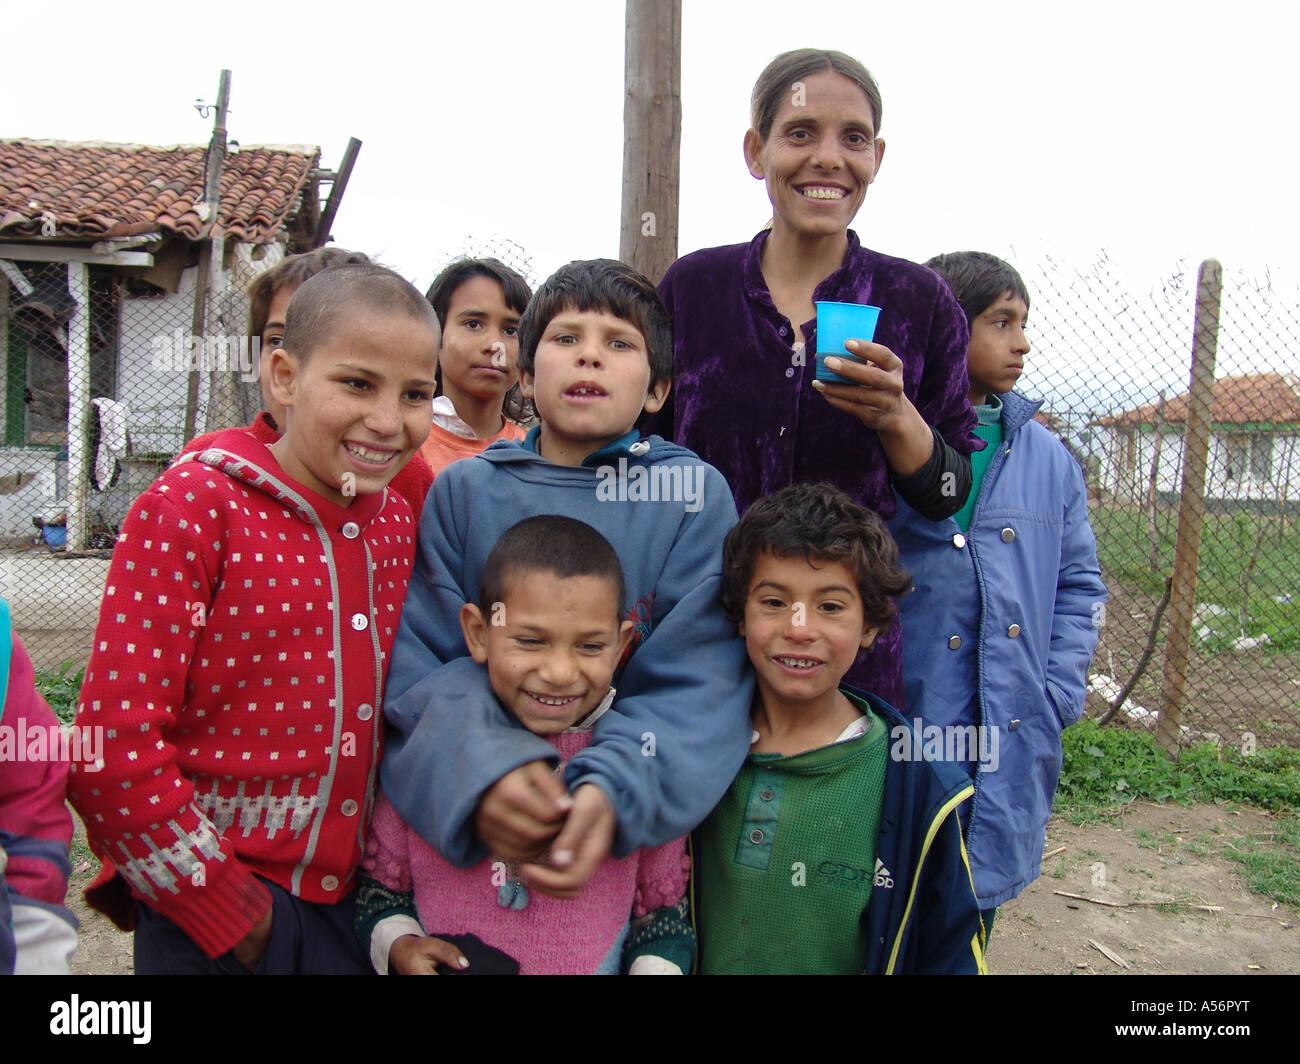 gipsy child Painet ja0737 family bulgaria romas karlova photo 2004 europe child kid children  kids gypsy gipsy country